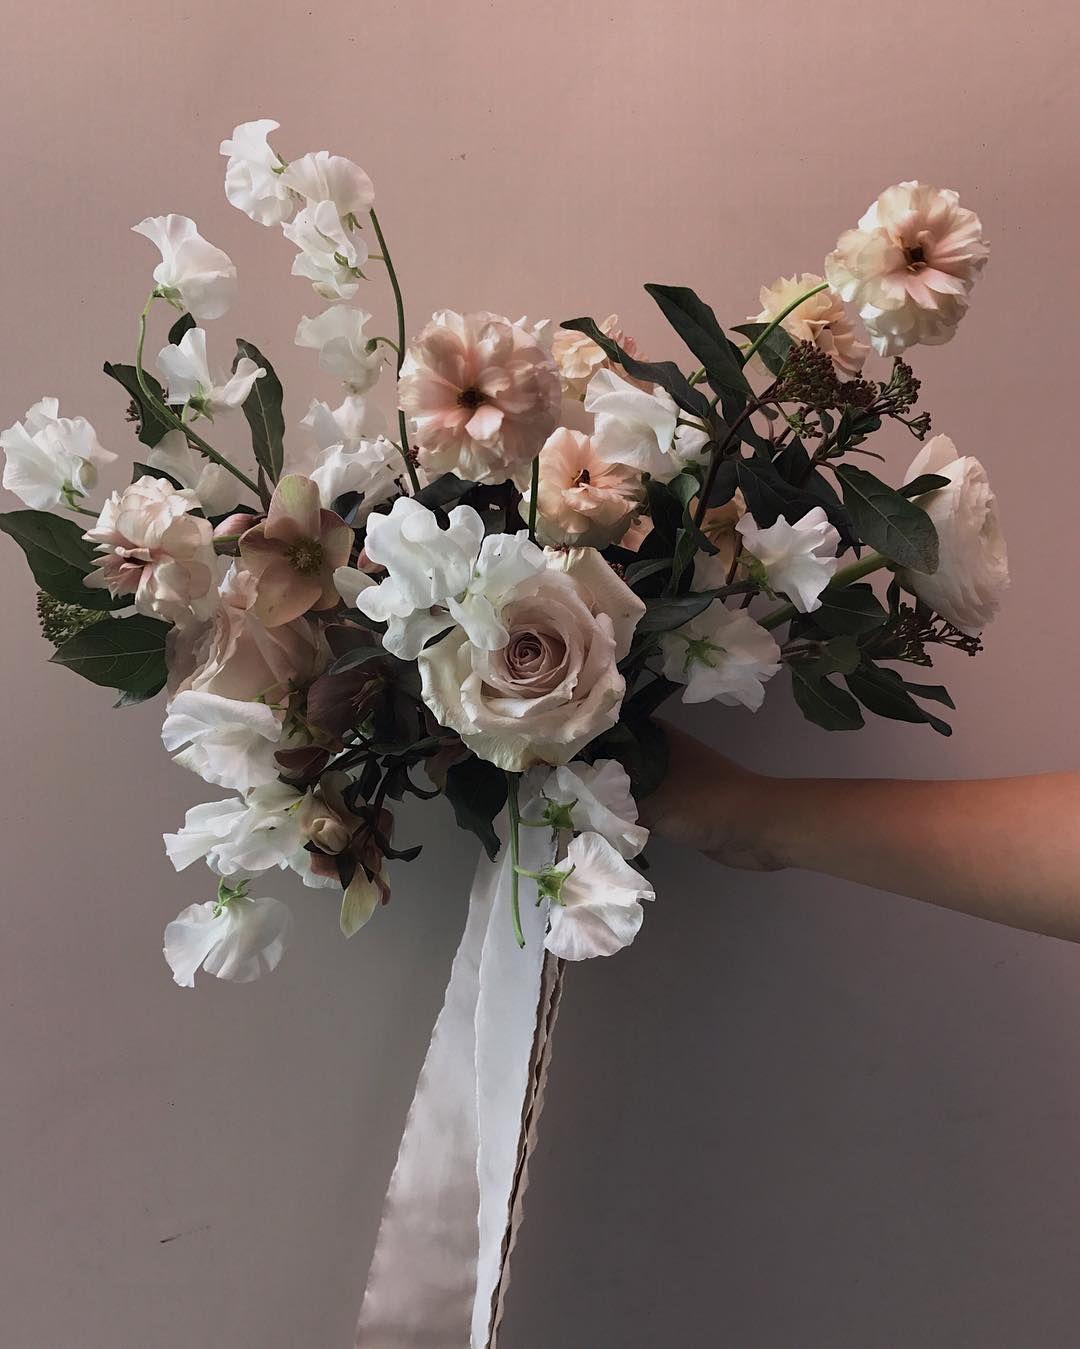 Amanda Luu + Ivanka Matsuba Flowering in San Francisco    Travel Welcomed! hello@studiomondine.com